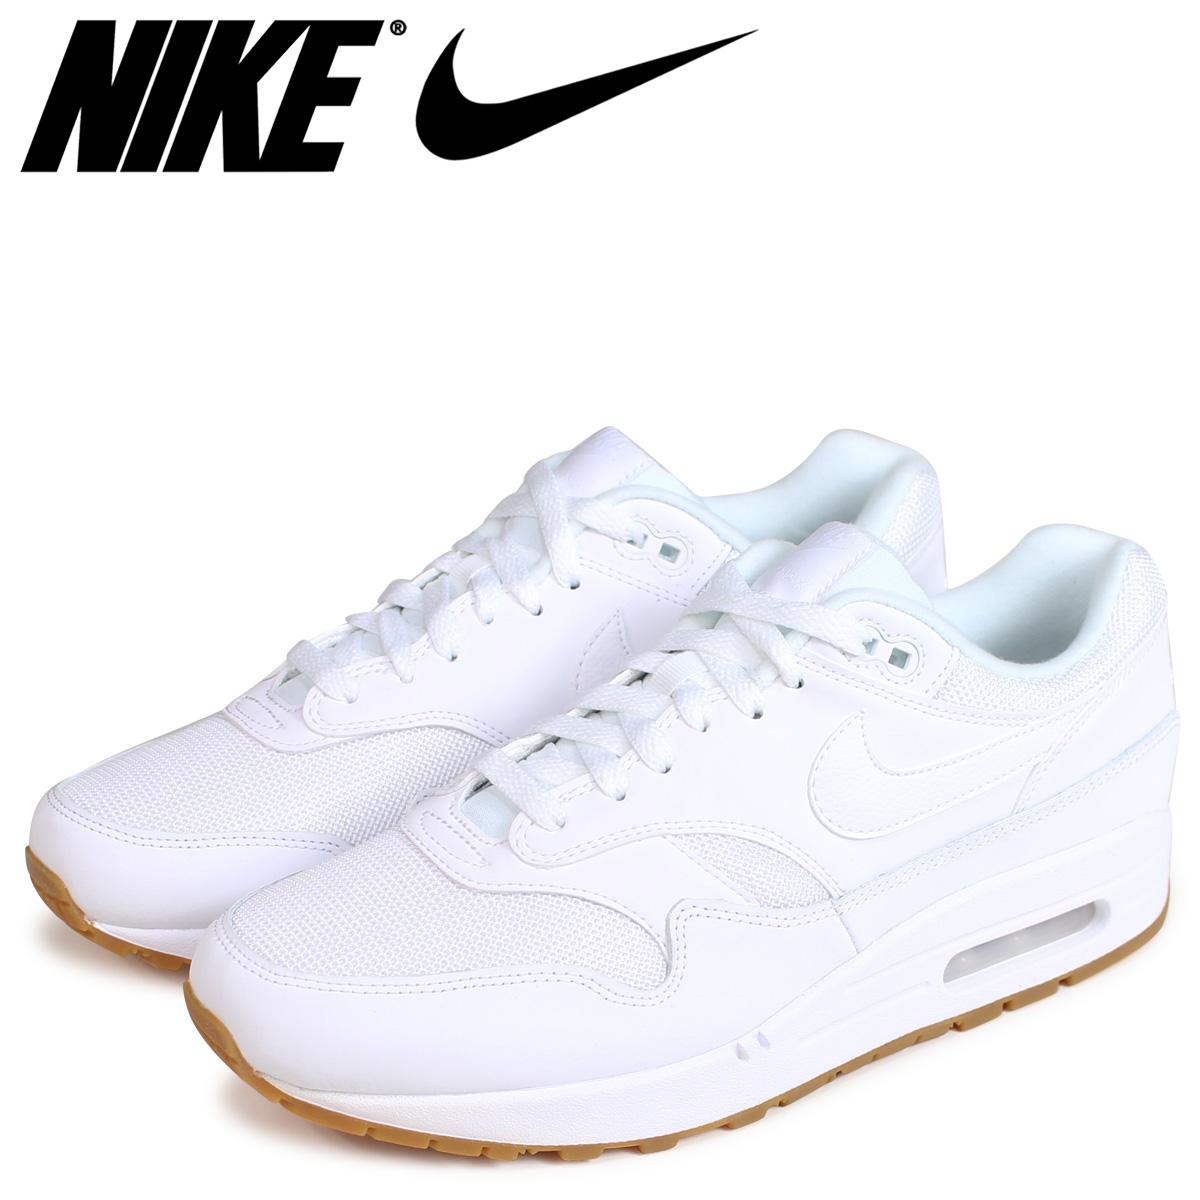 NIKE Kie Ney AMAX 1 sneakers men AIR MAX 1 AH8145 109 white white